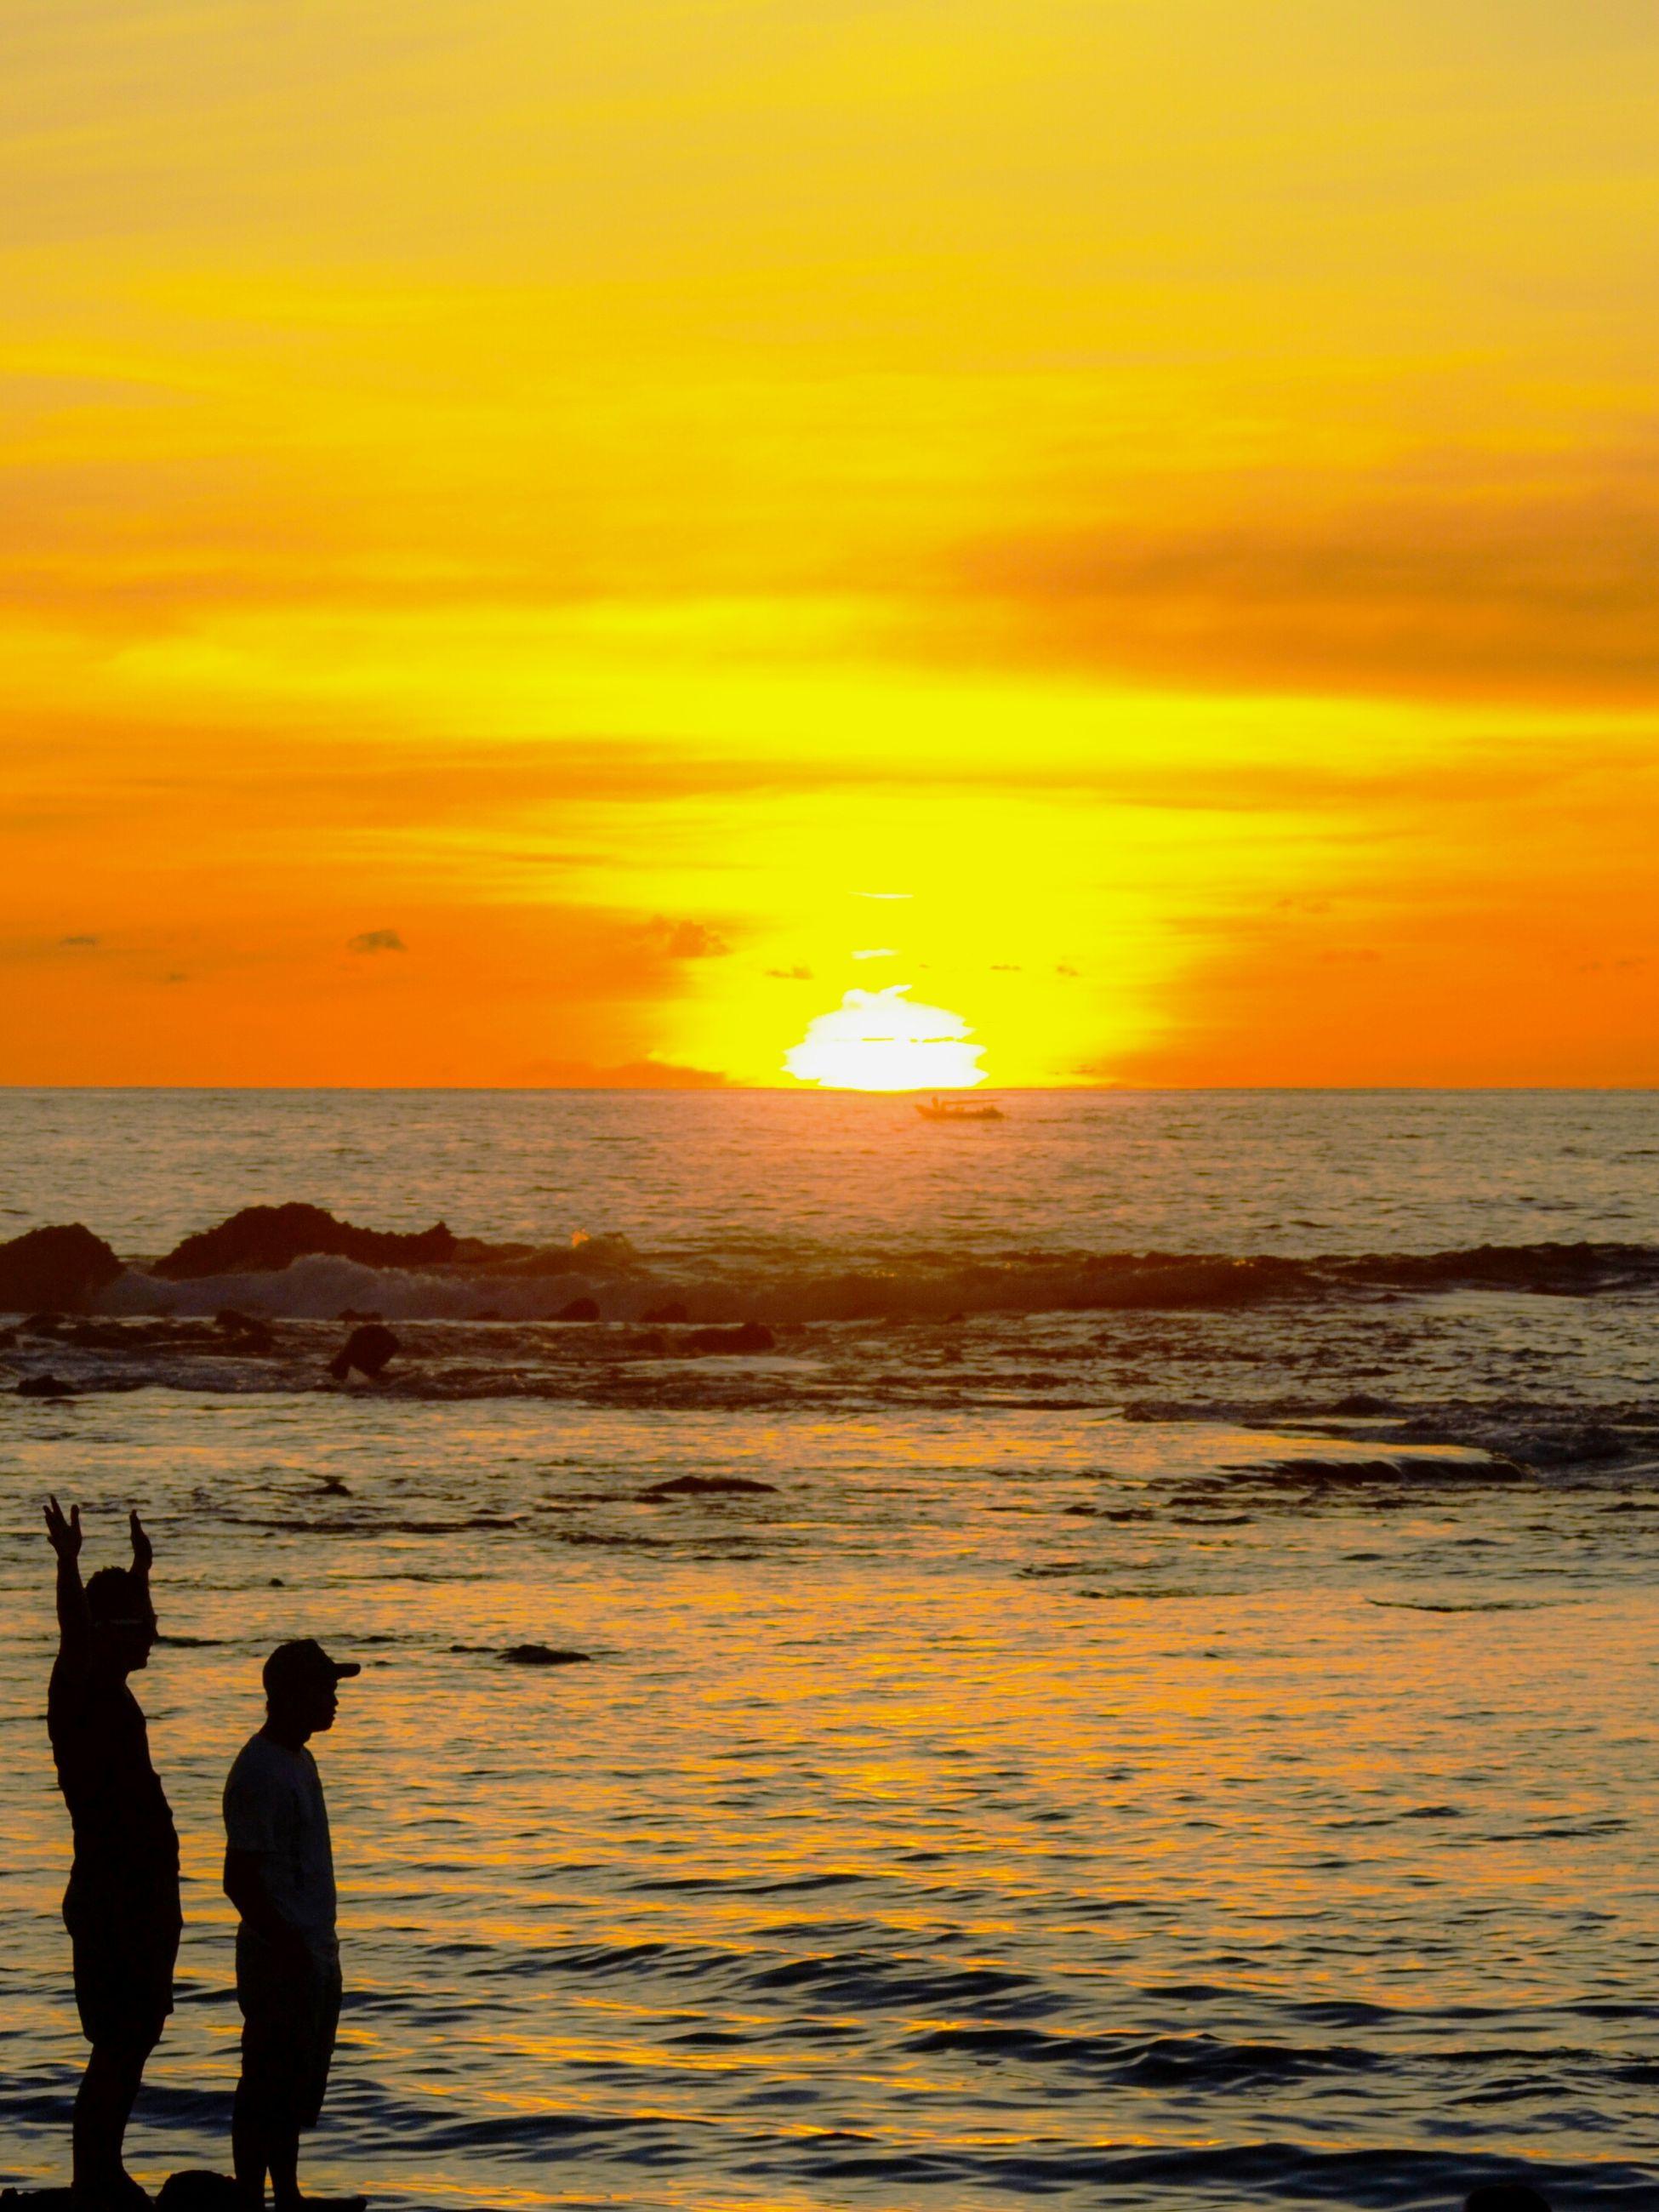 sea, horizon over water, sunset, water, scenics, sky, beach, beauty in nature, orange color, silhouette, leisure activity, tranquil scene, lifestyles, tranquility, sun, idyllic, men, shore, nature